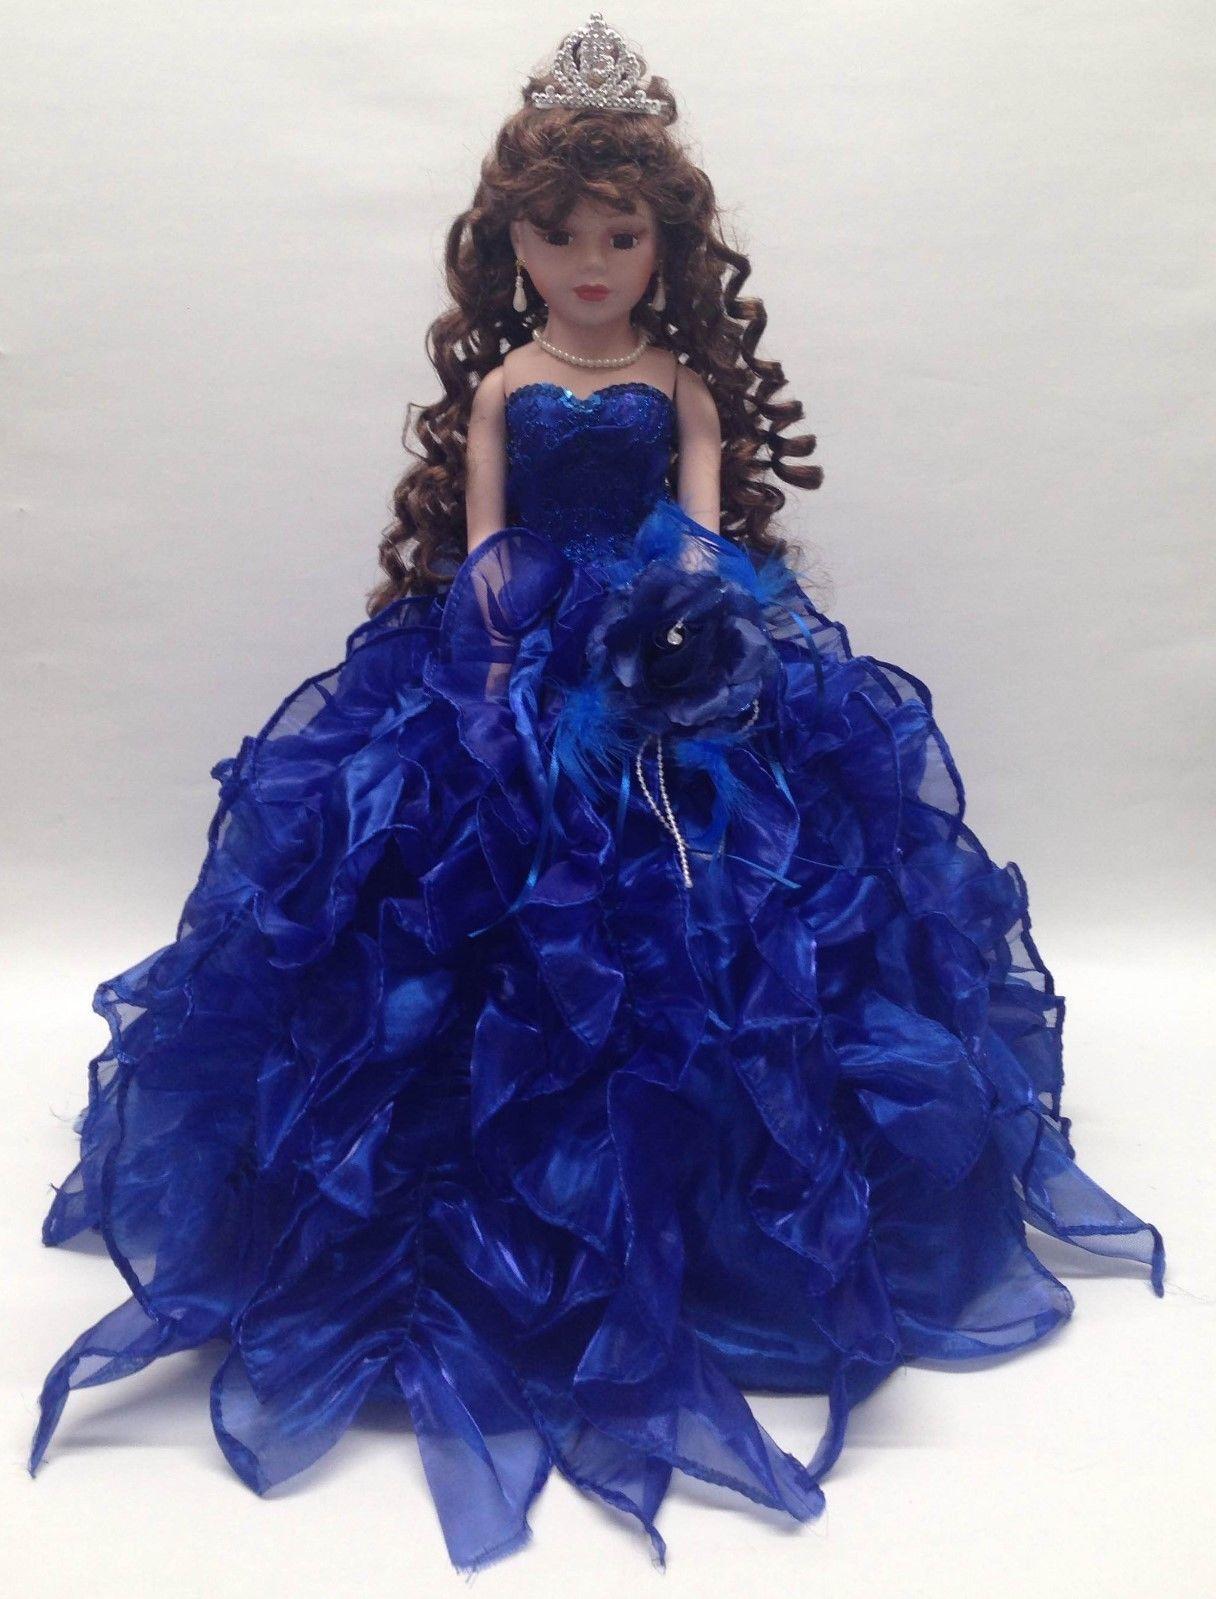 porcelain dolls | 18 inch Porcelain Umbrella Dolls Quince Anos Pink ...